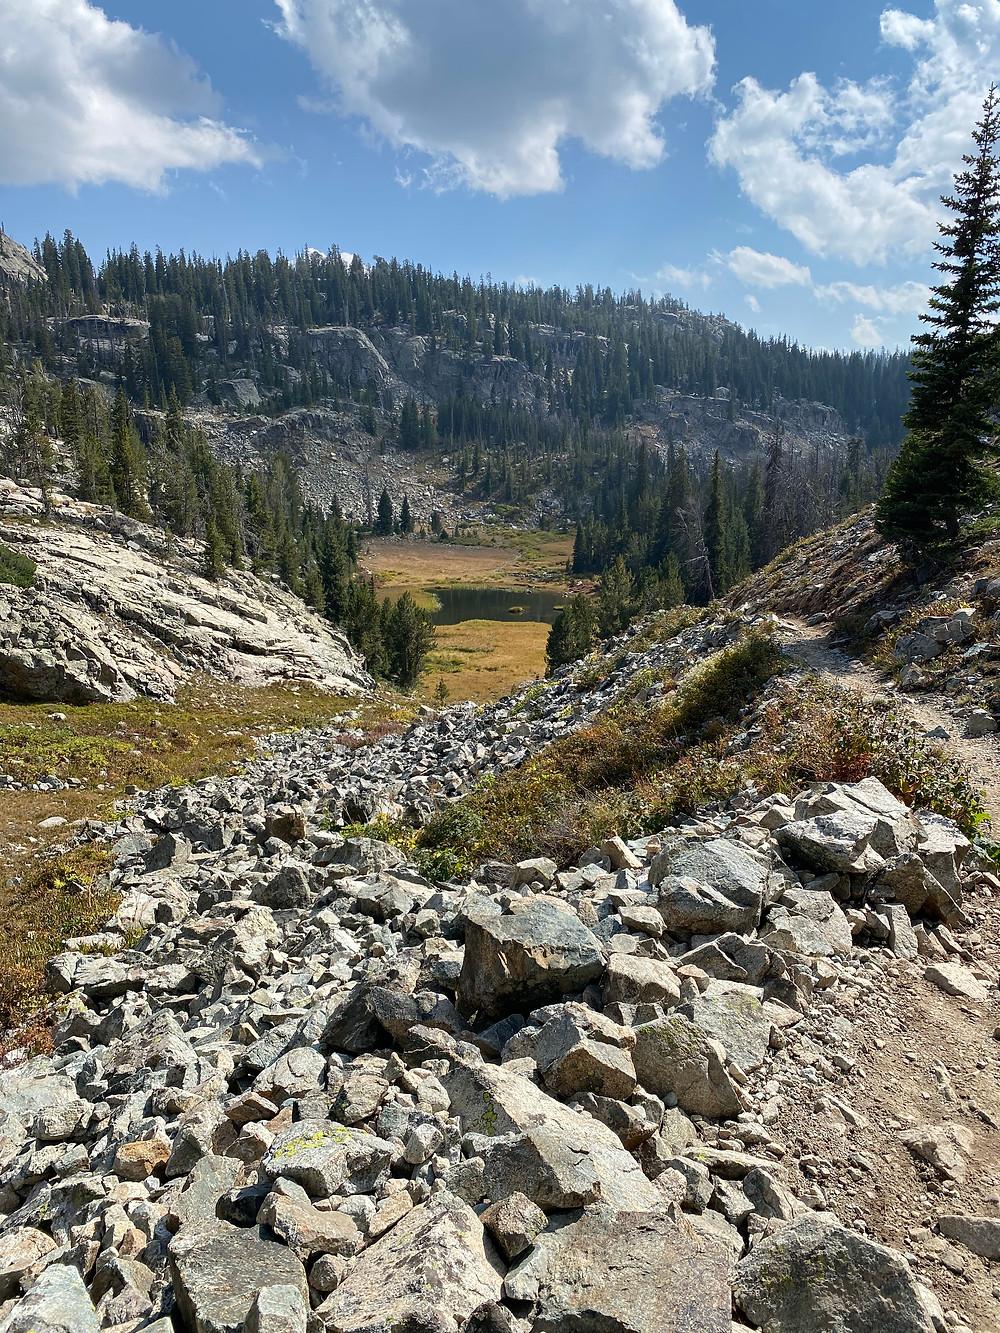 Evergreen-covered hillsides in Bridger-Teton National Forest in Wyoming